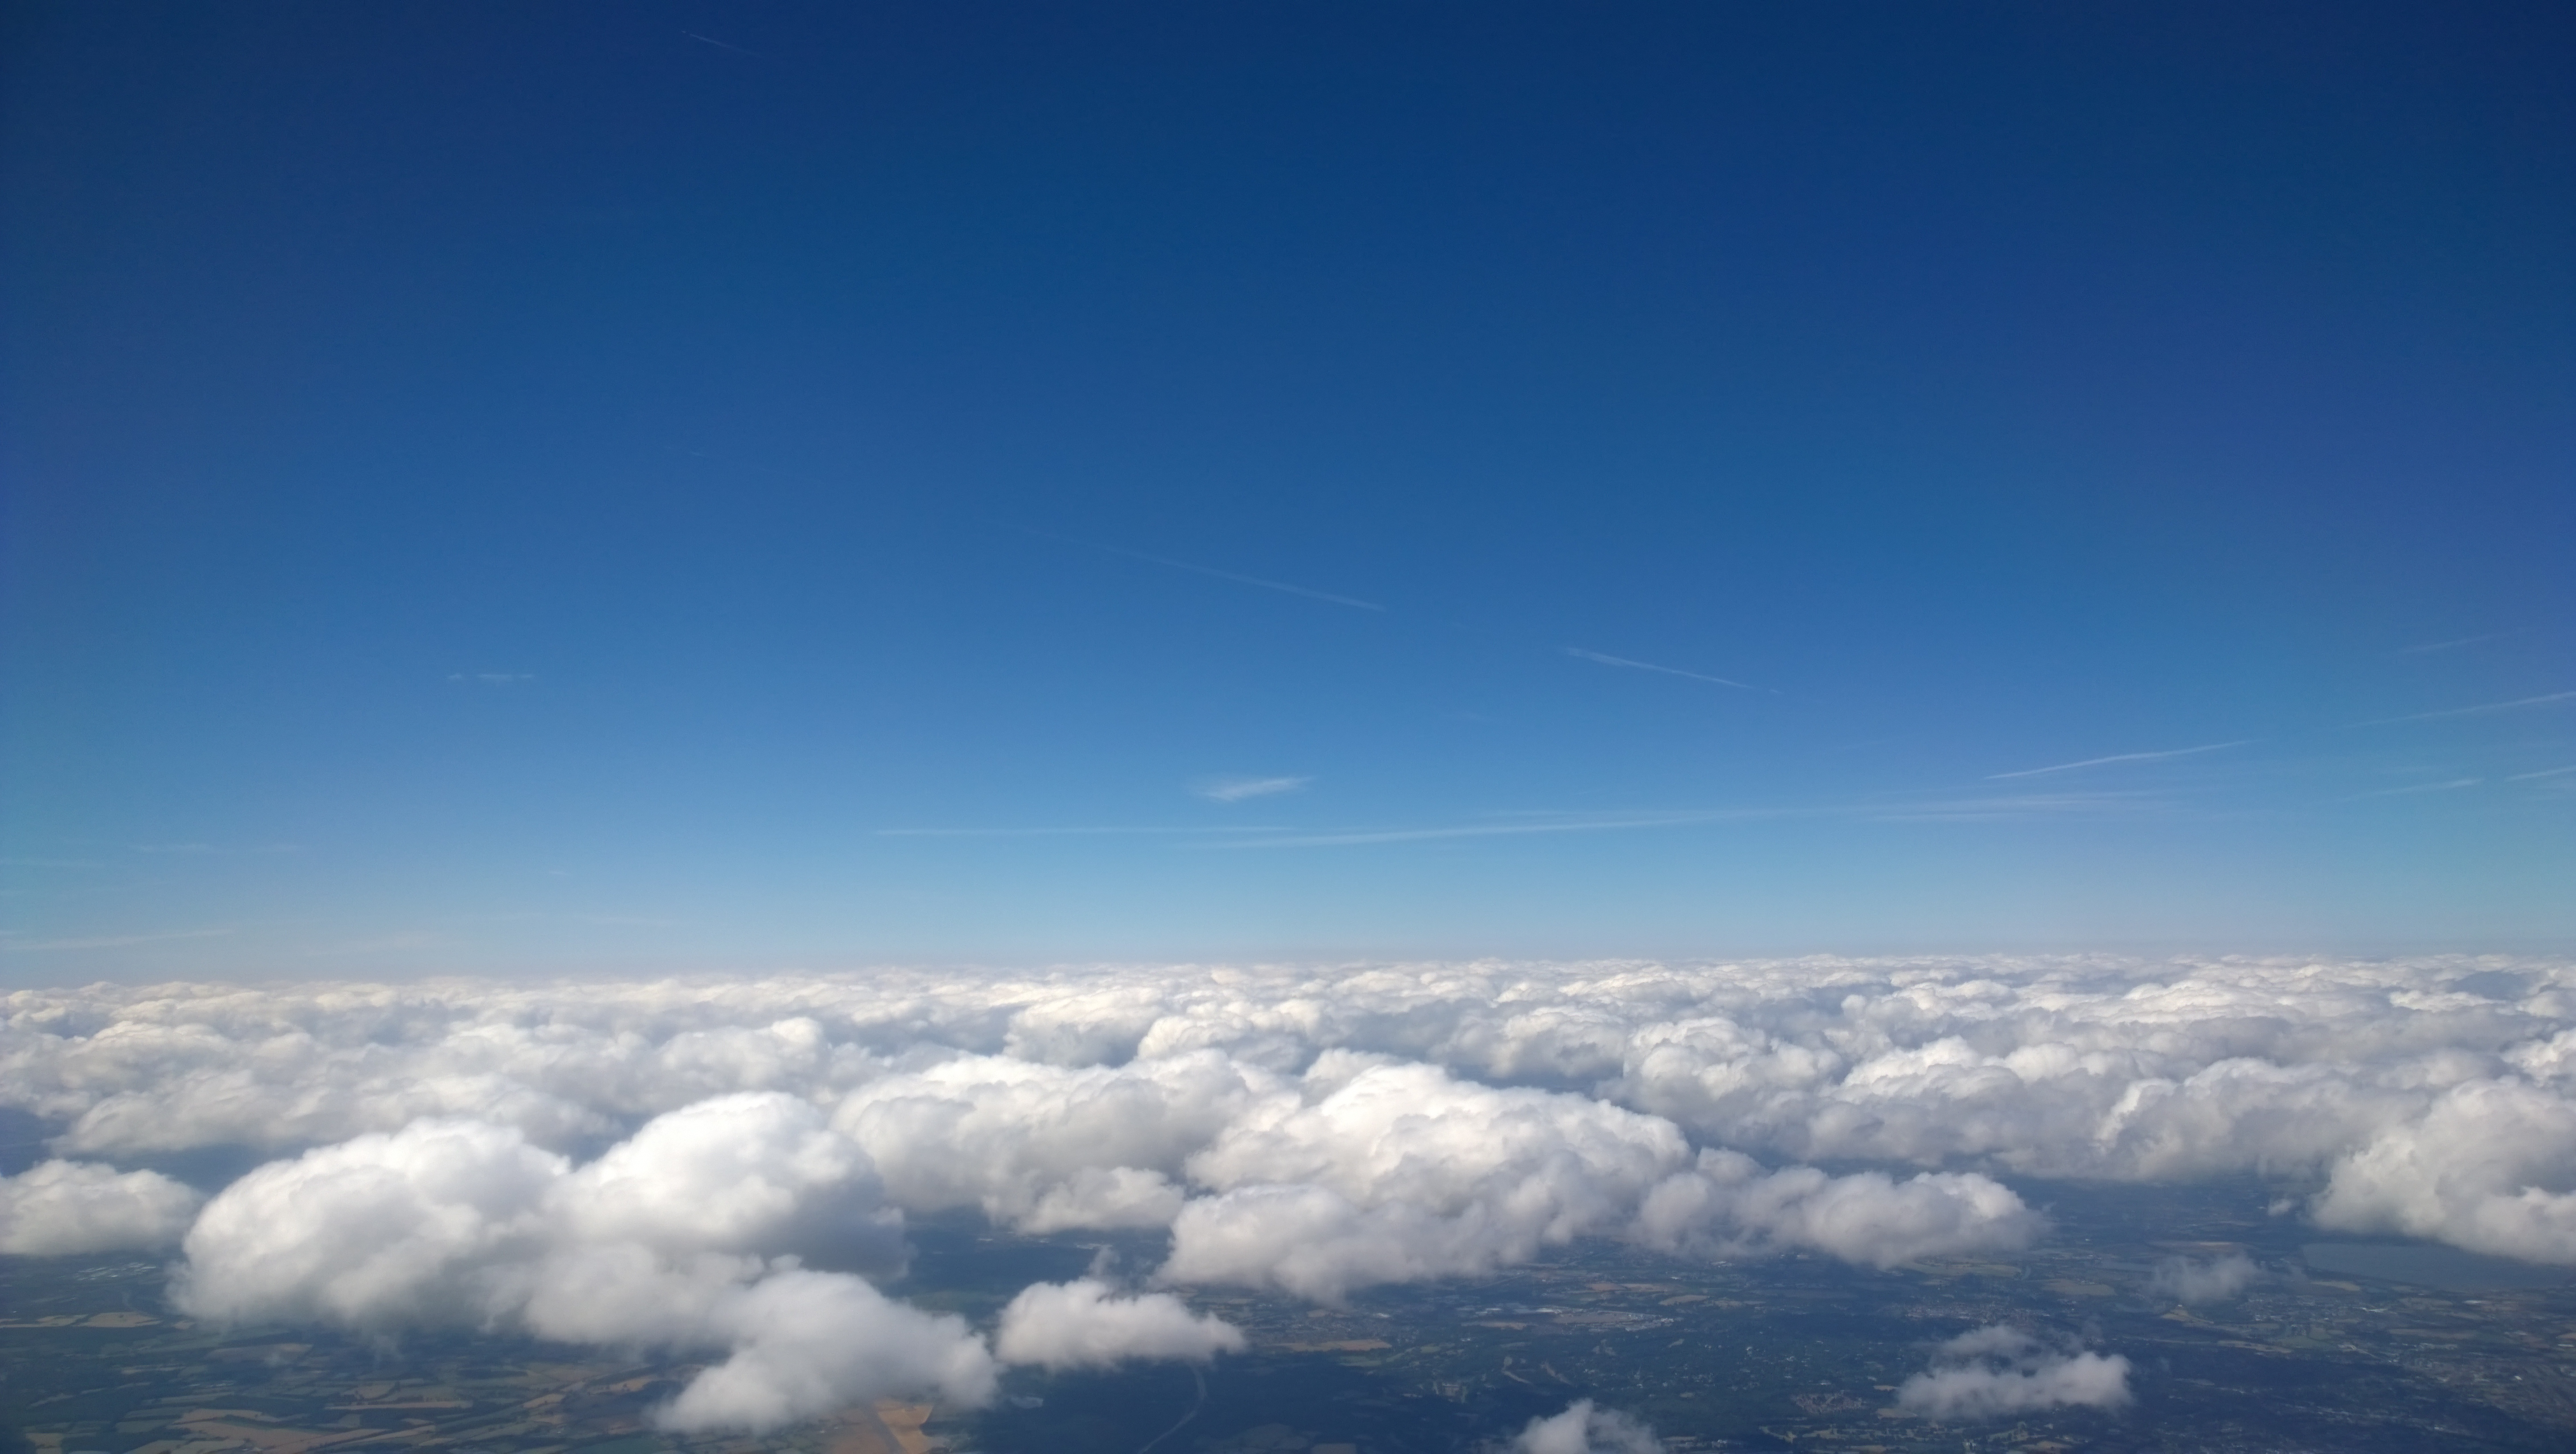 above clouds hdri - DriverLayer Search Engine